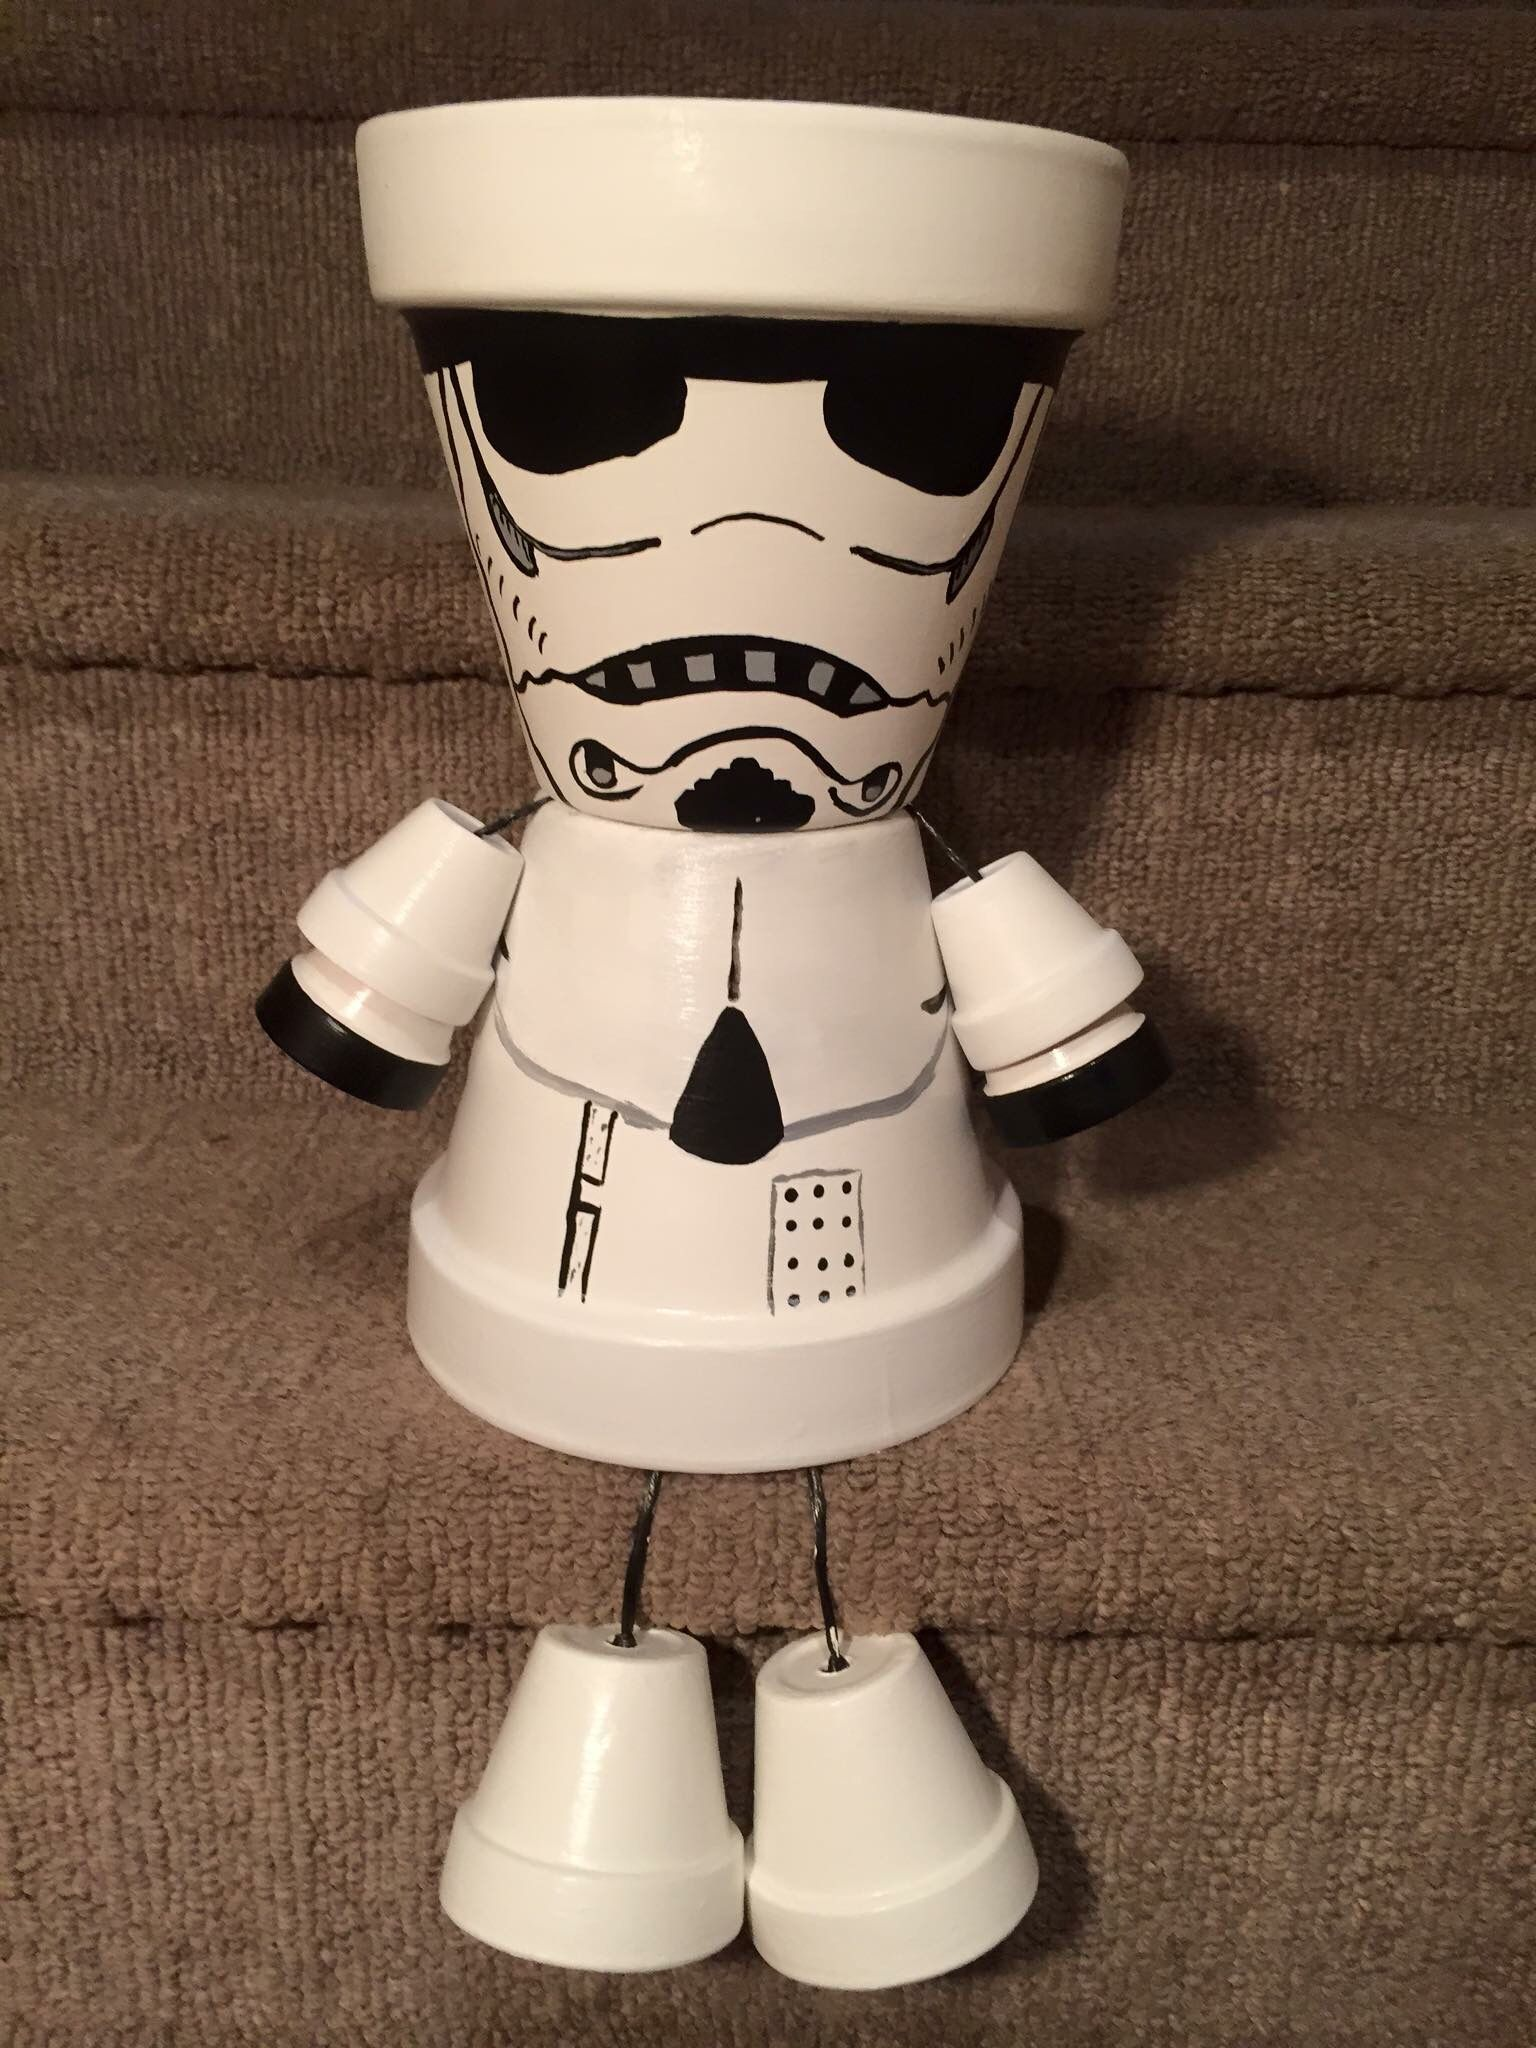 storm trooper star wars pot people gartenaccessoires pinterest gonis geschenke basteln. Black Bedroom Furniture Sets. Home Design Ideas